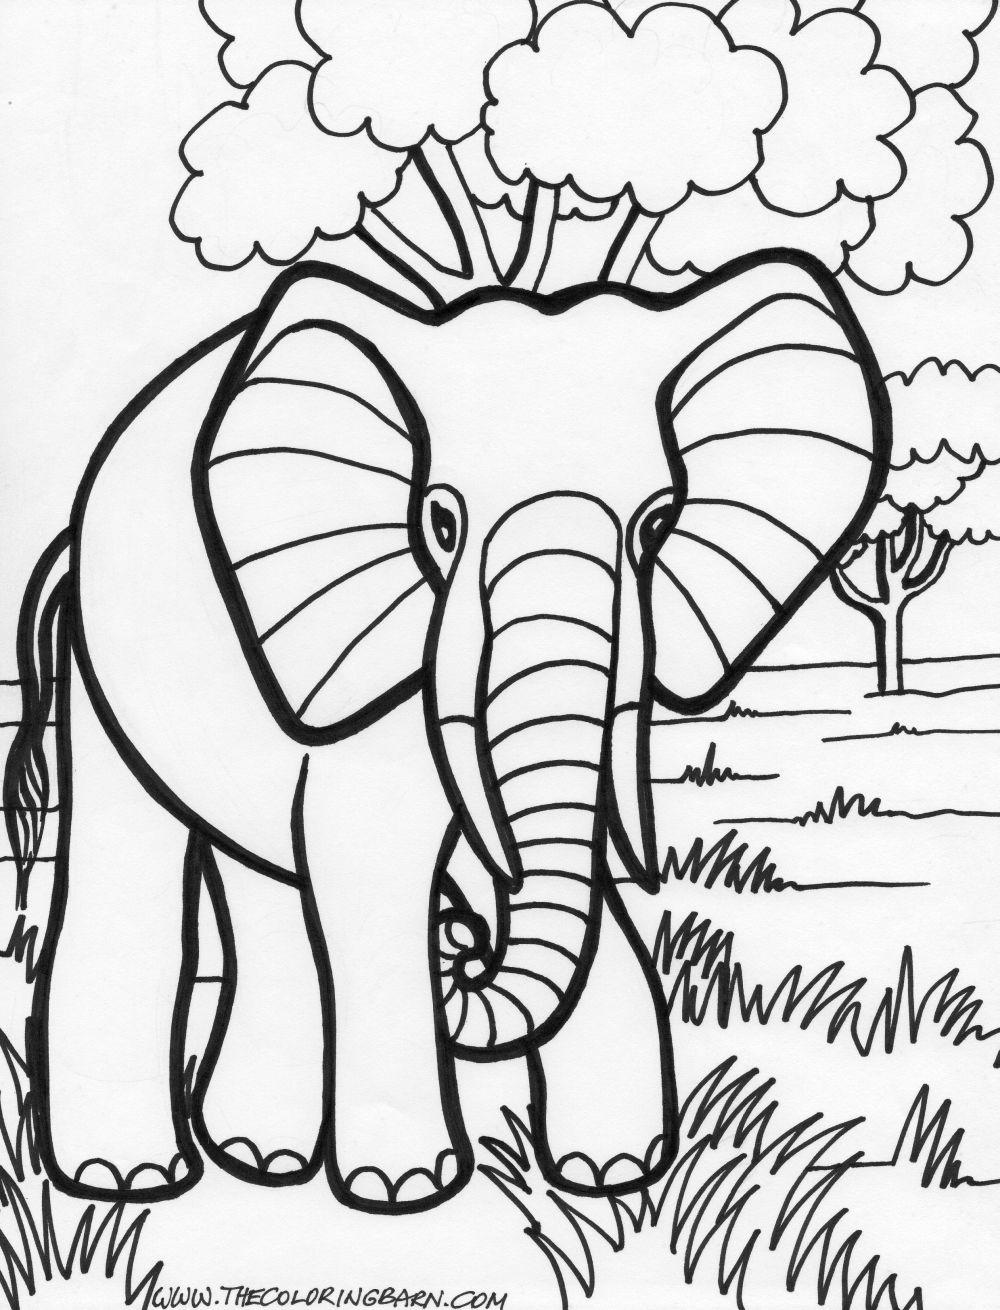 transmissionpress: 14 Elephant Coloring Pages for Kids